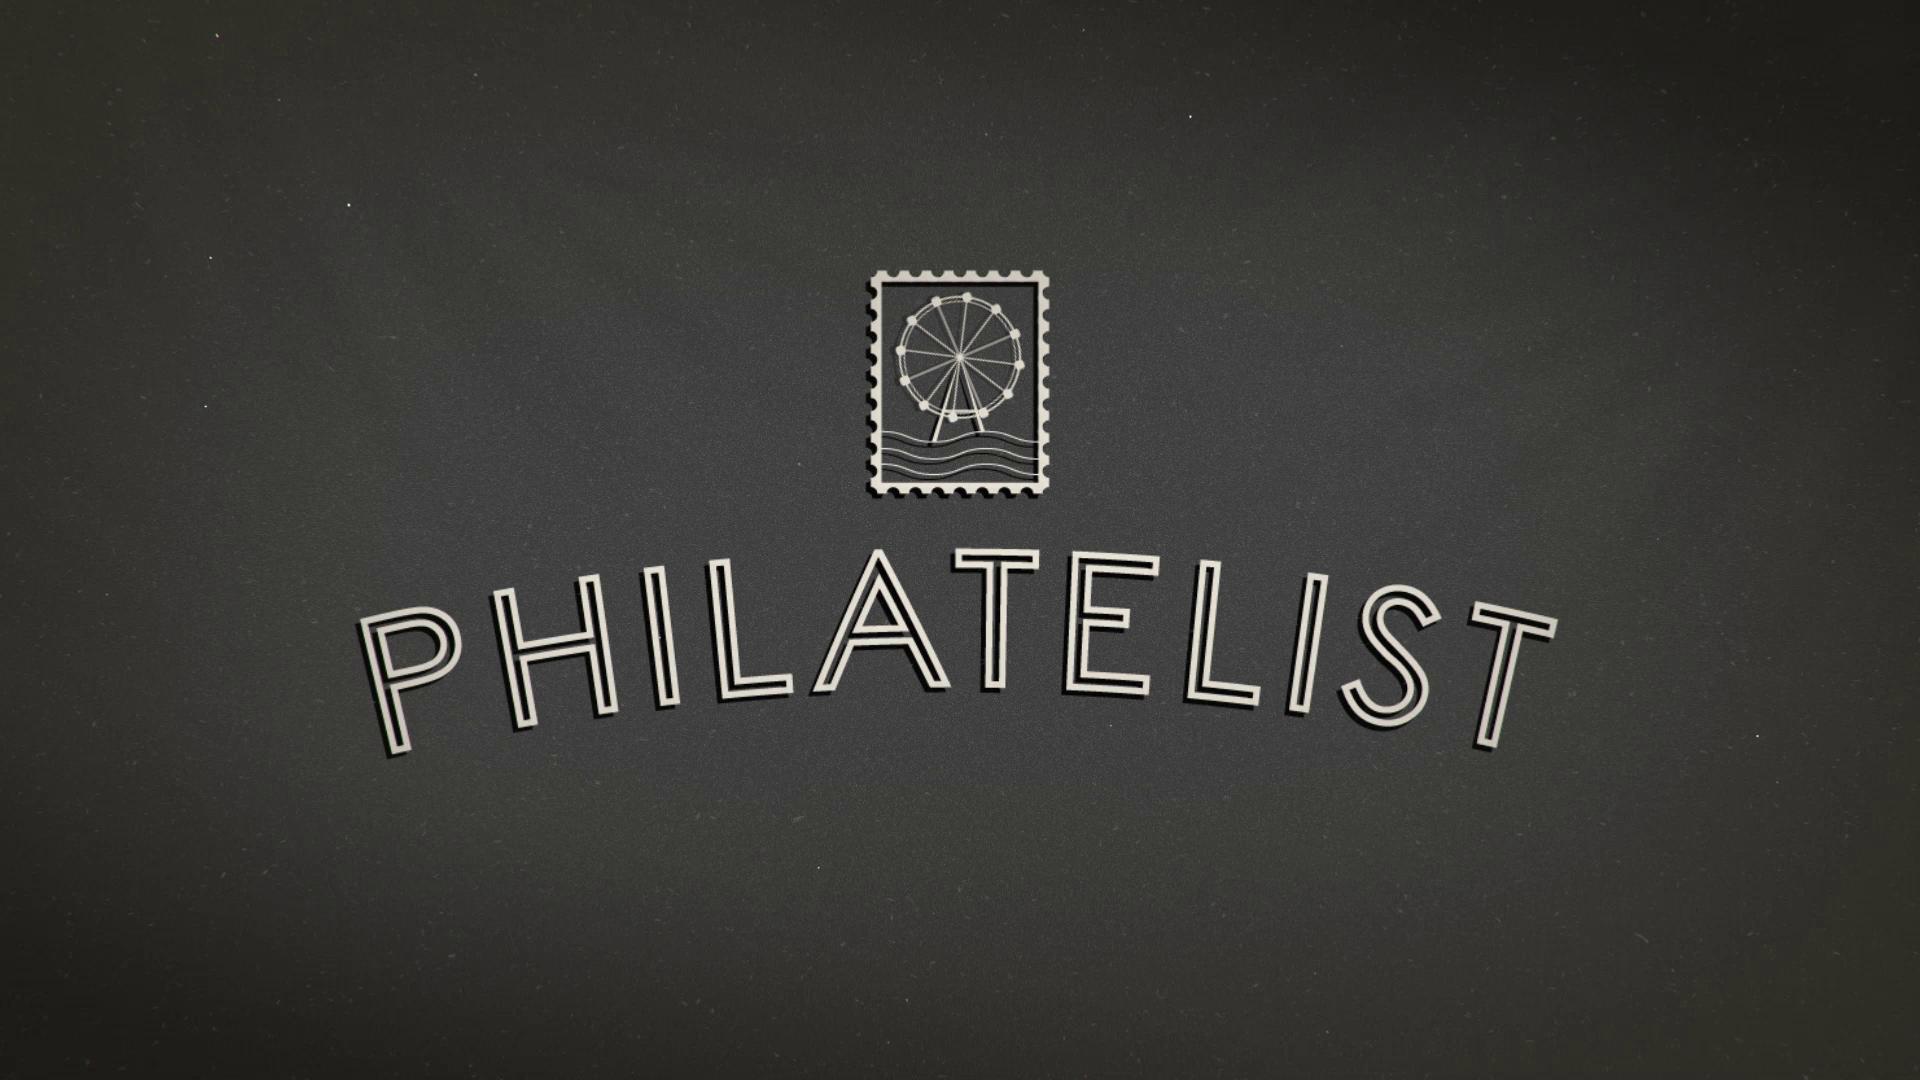 Philatelist